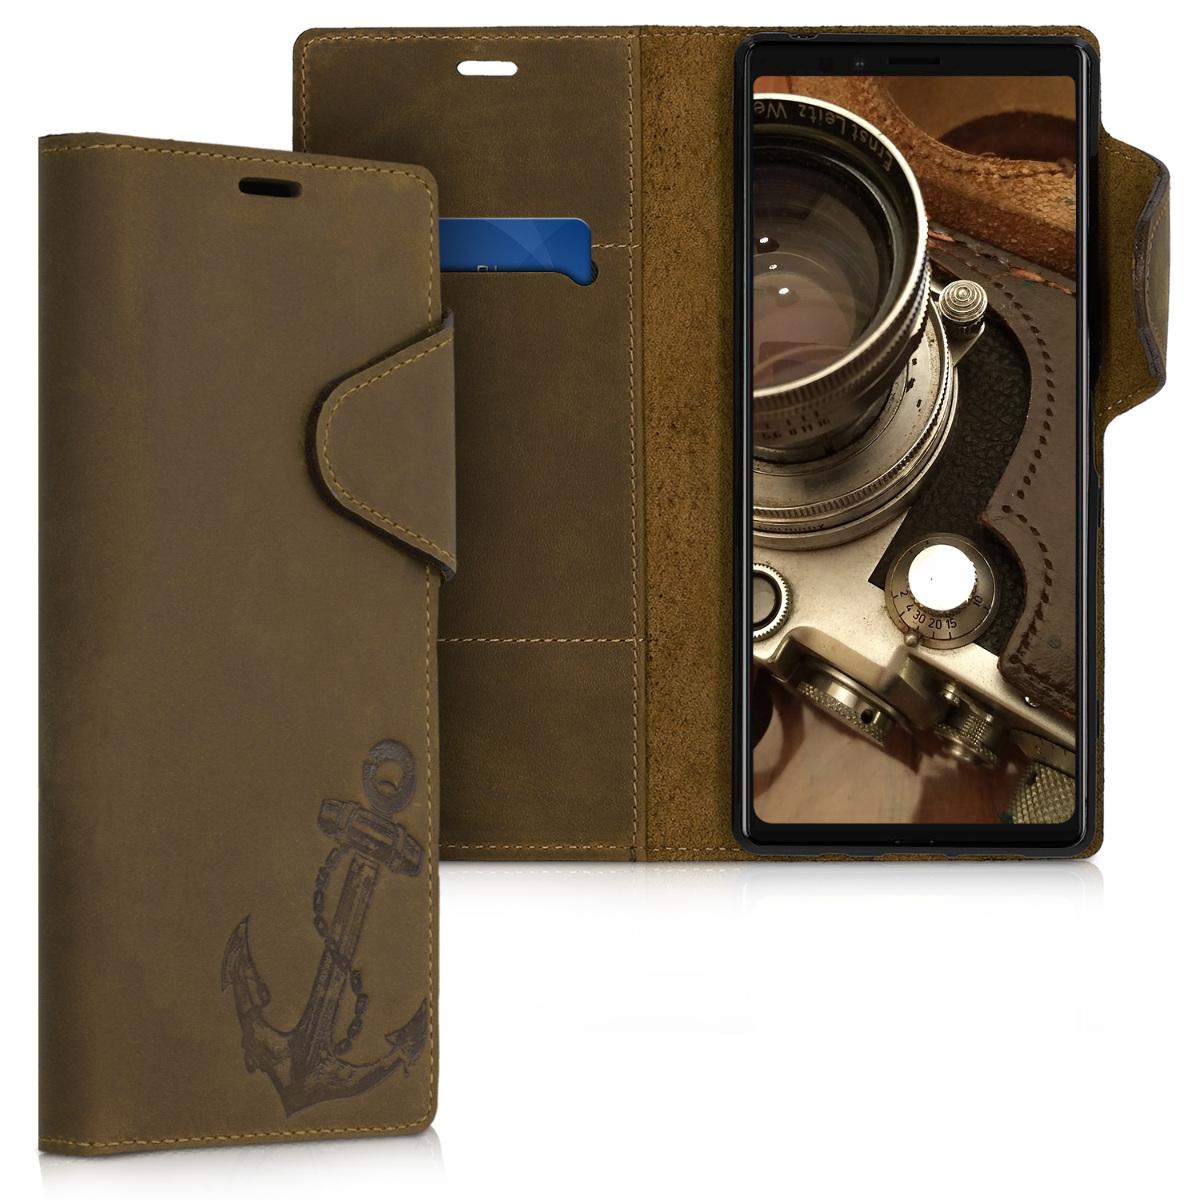 Kalibri Δερμάτινη Suede Θήκη - Πορτοφόλι Sony Xperia 1 - Brown (47991.02)